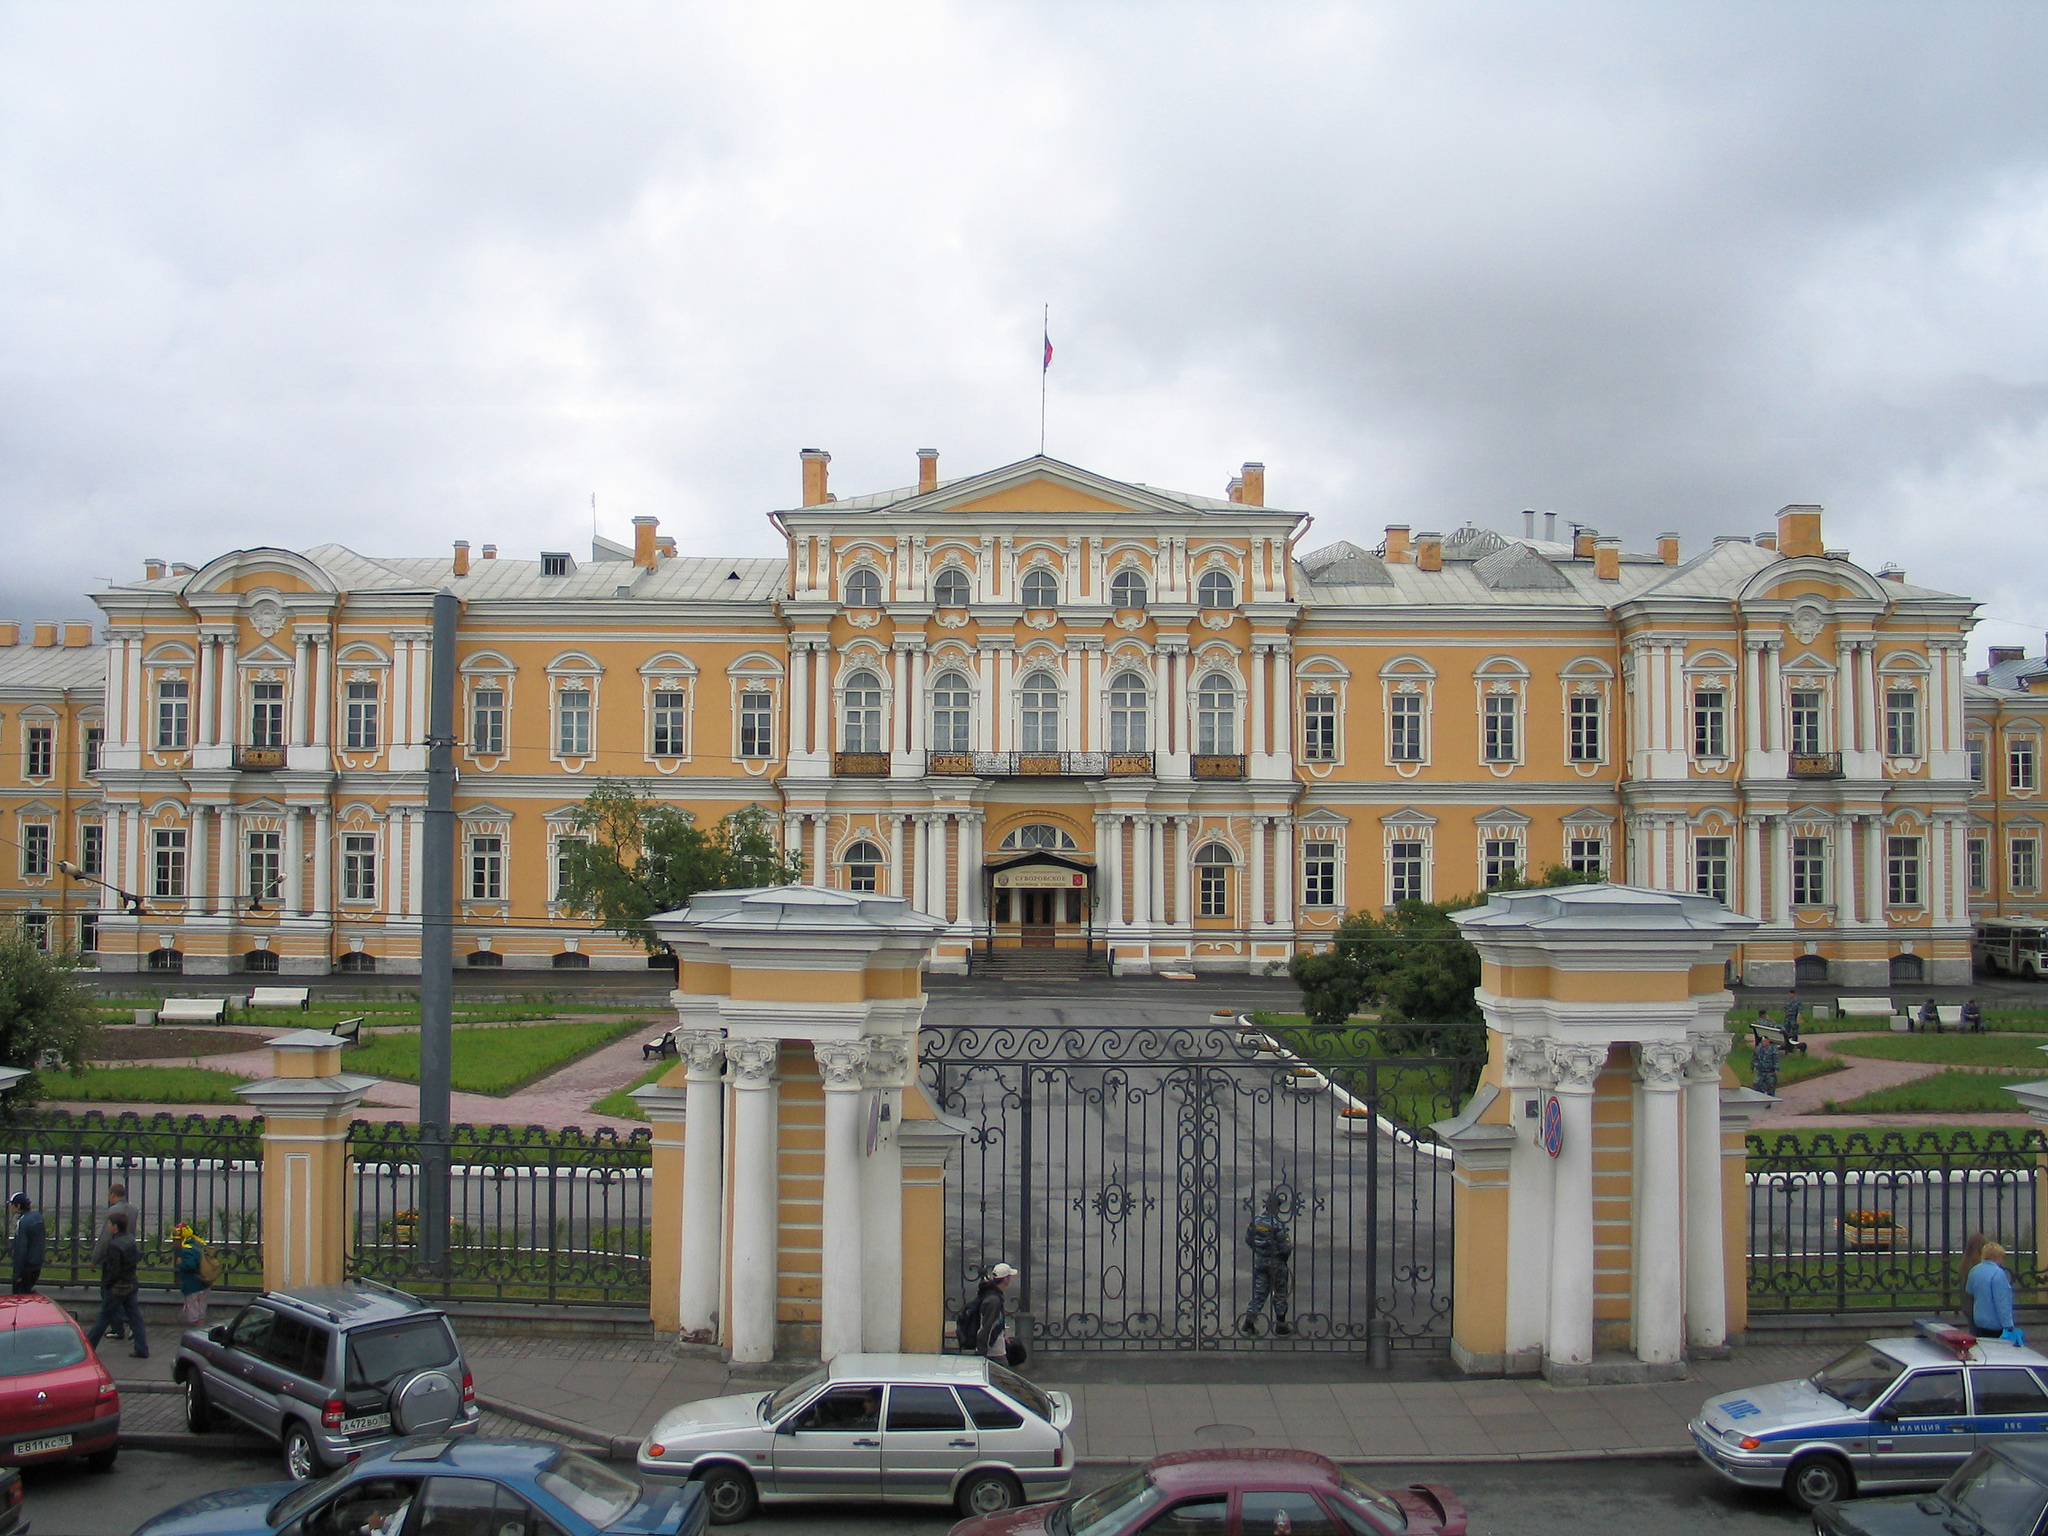 Воронцовский дворец в Санкт-Петербурге